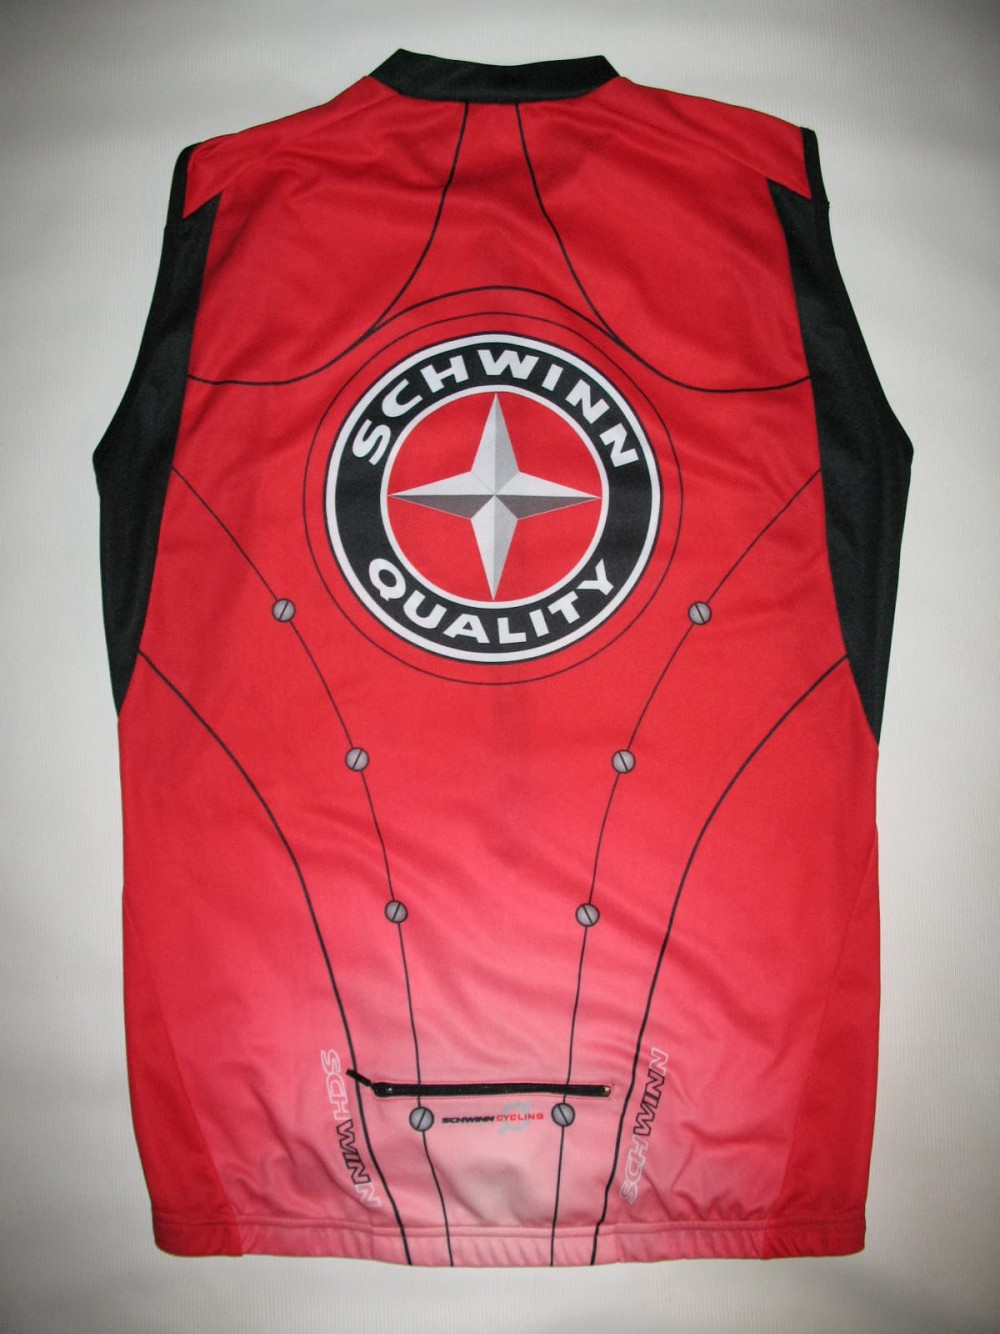 Веломайка SCHWINN ss cycling jersey (размер XL) - 1